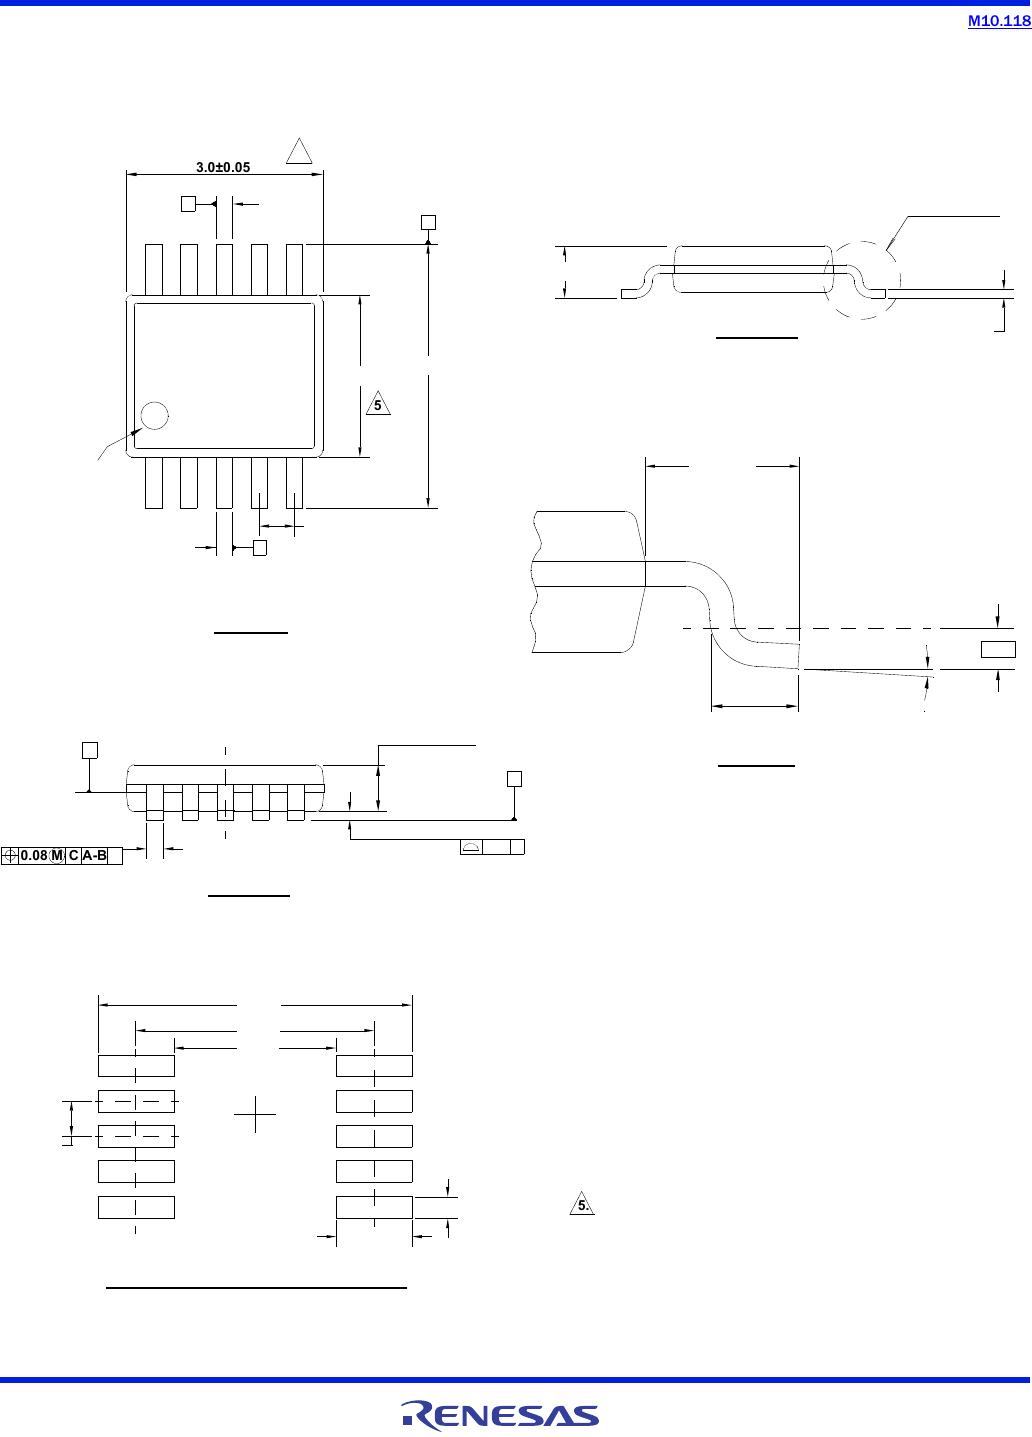 hight resolution of isl3170e isl3171e isl3172e isl3173e isl3174e isl3175e isl3176e isl3177e isl3178e